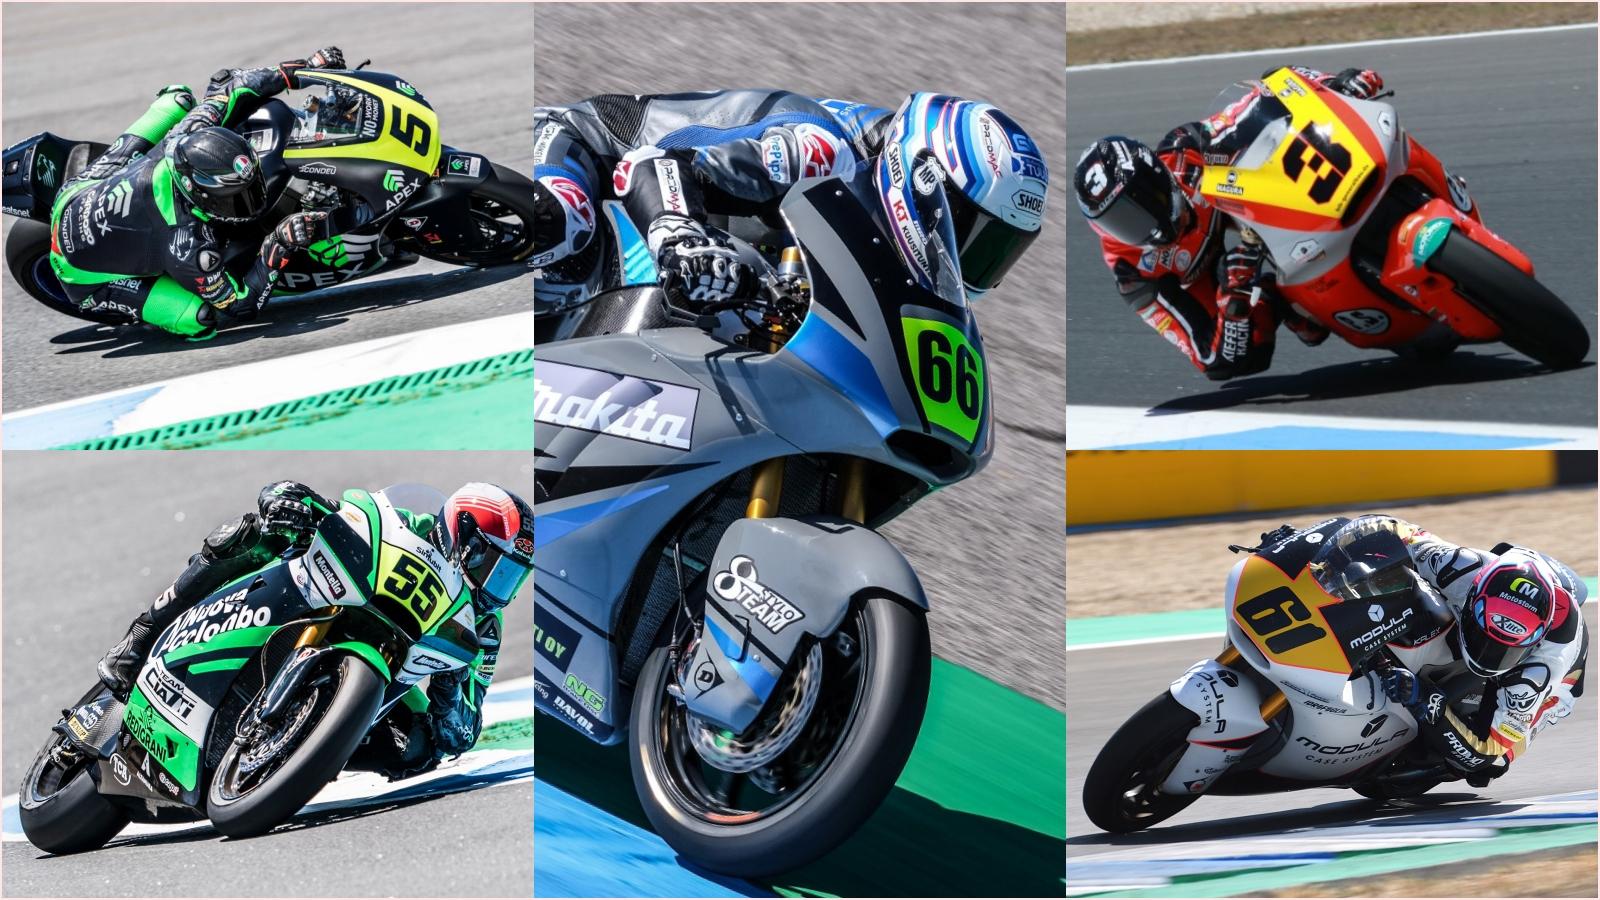 Europeo Moto2 2020: pilotos, motos, equipos, calendario, 1+3 españoles y cinco favoritos